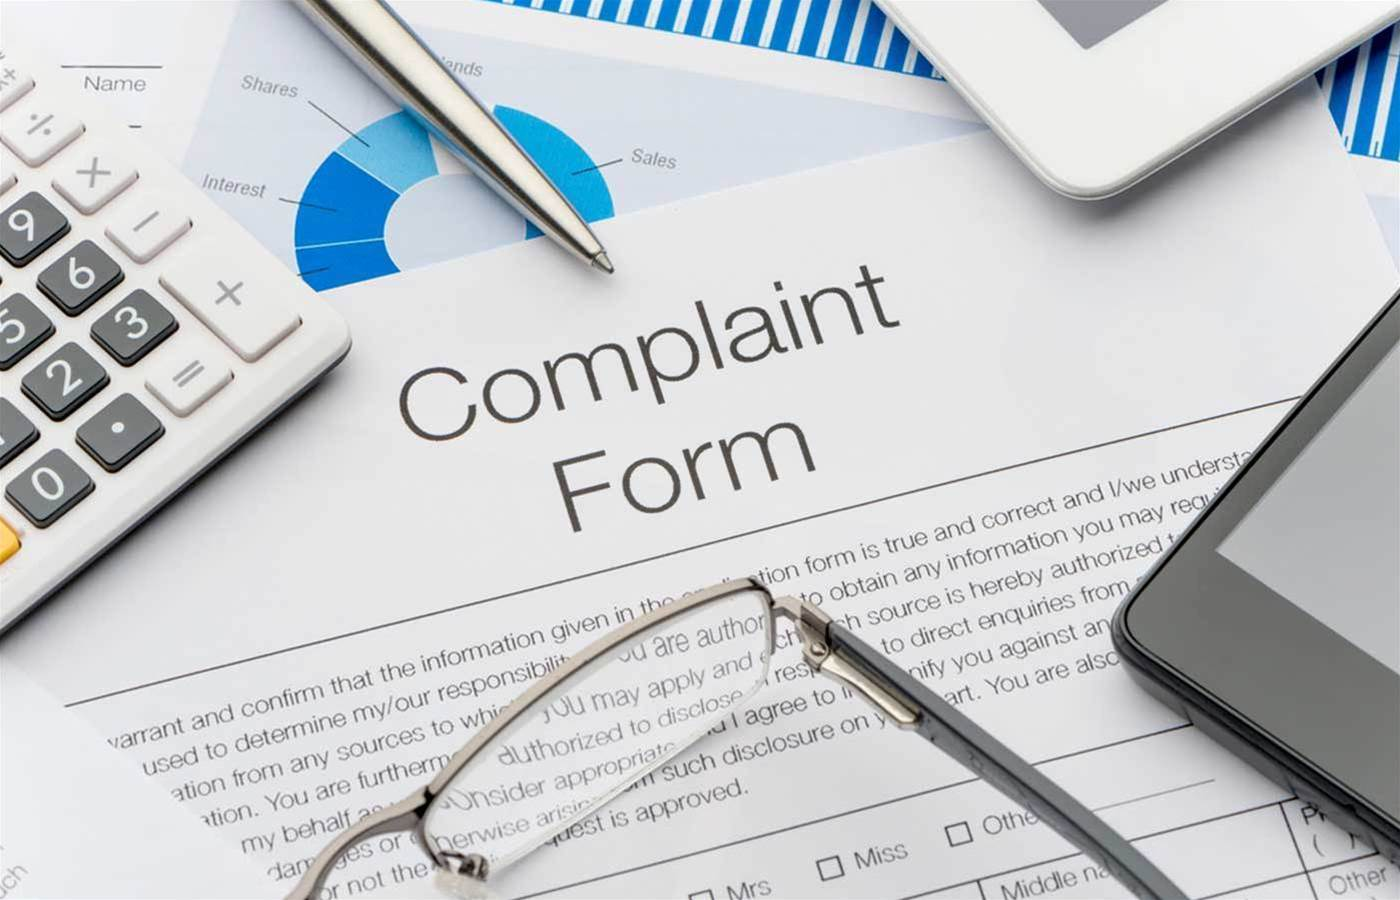 Complaints against Telstra, Optus, Vodafone down